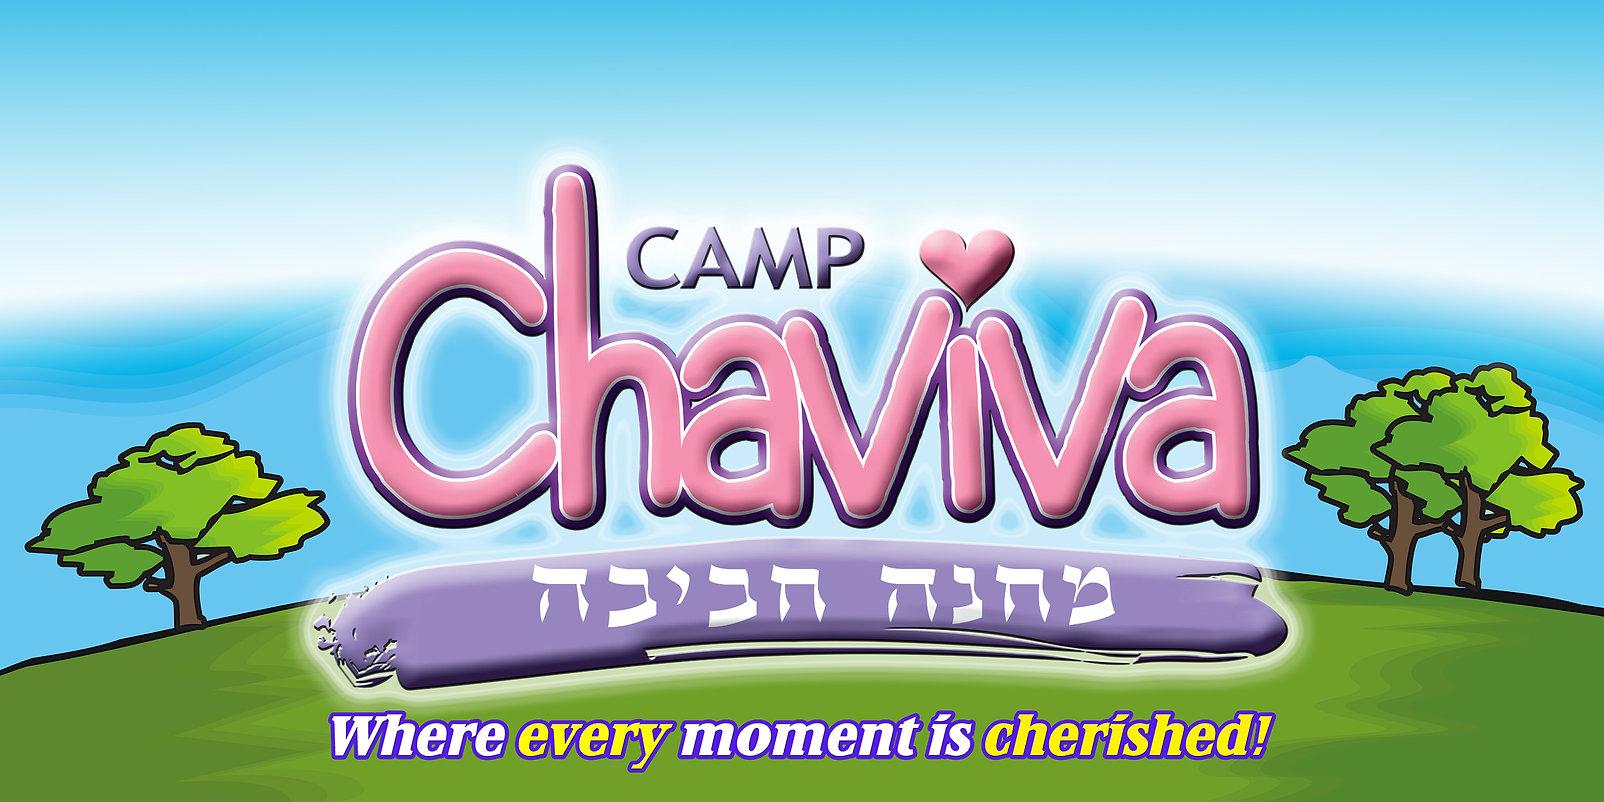 chaviva sign new - ID Card.jpg